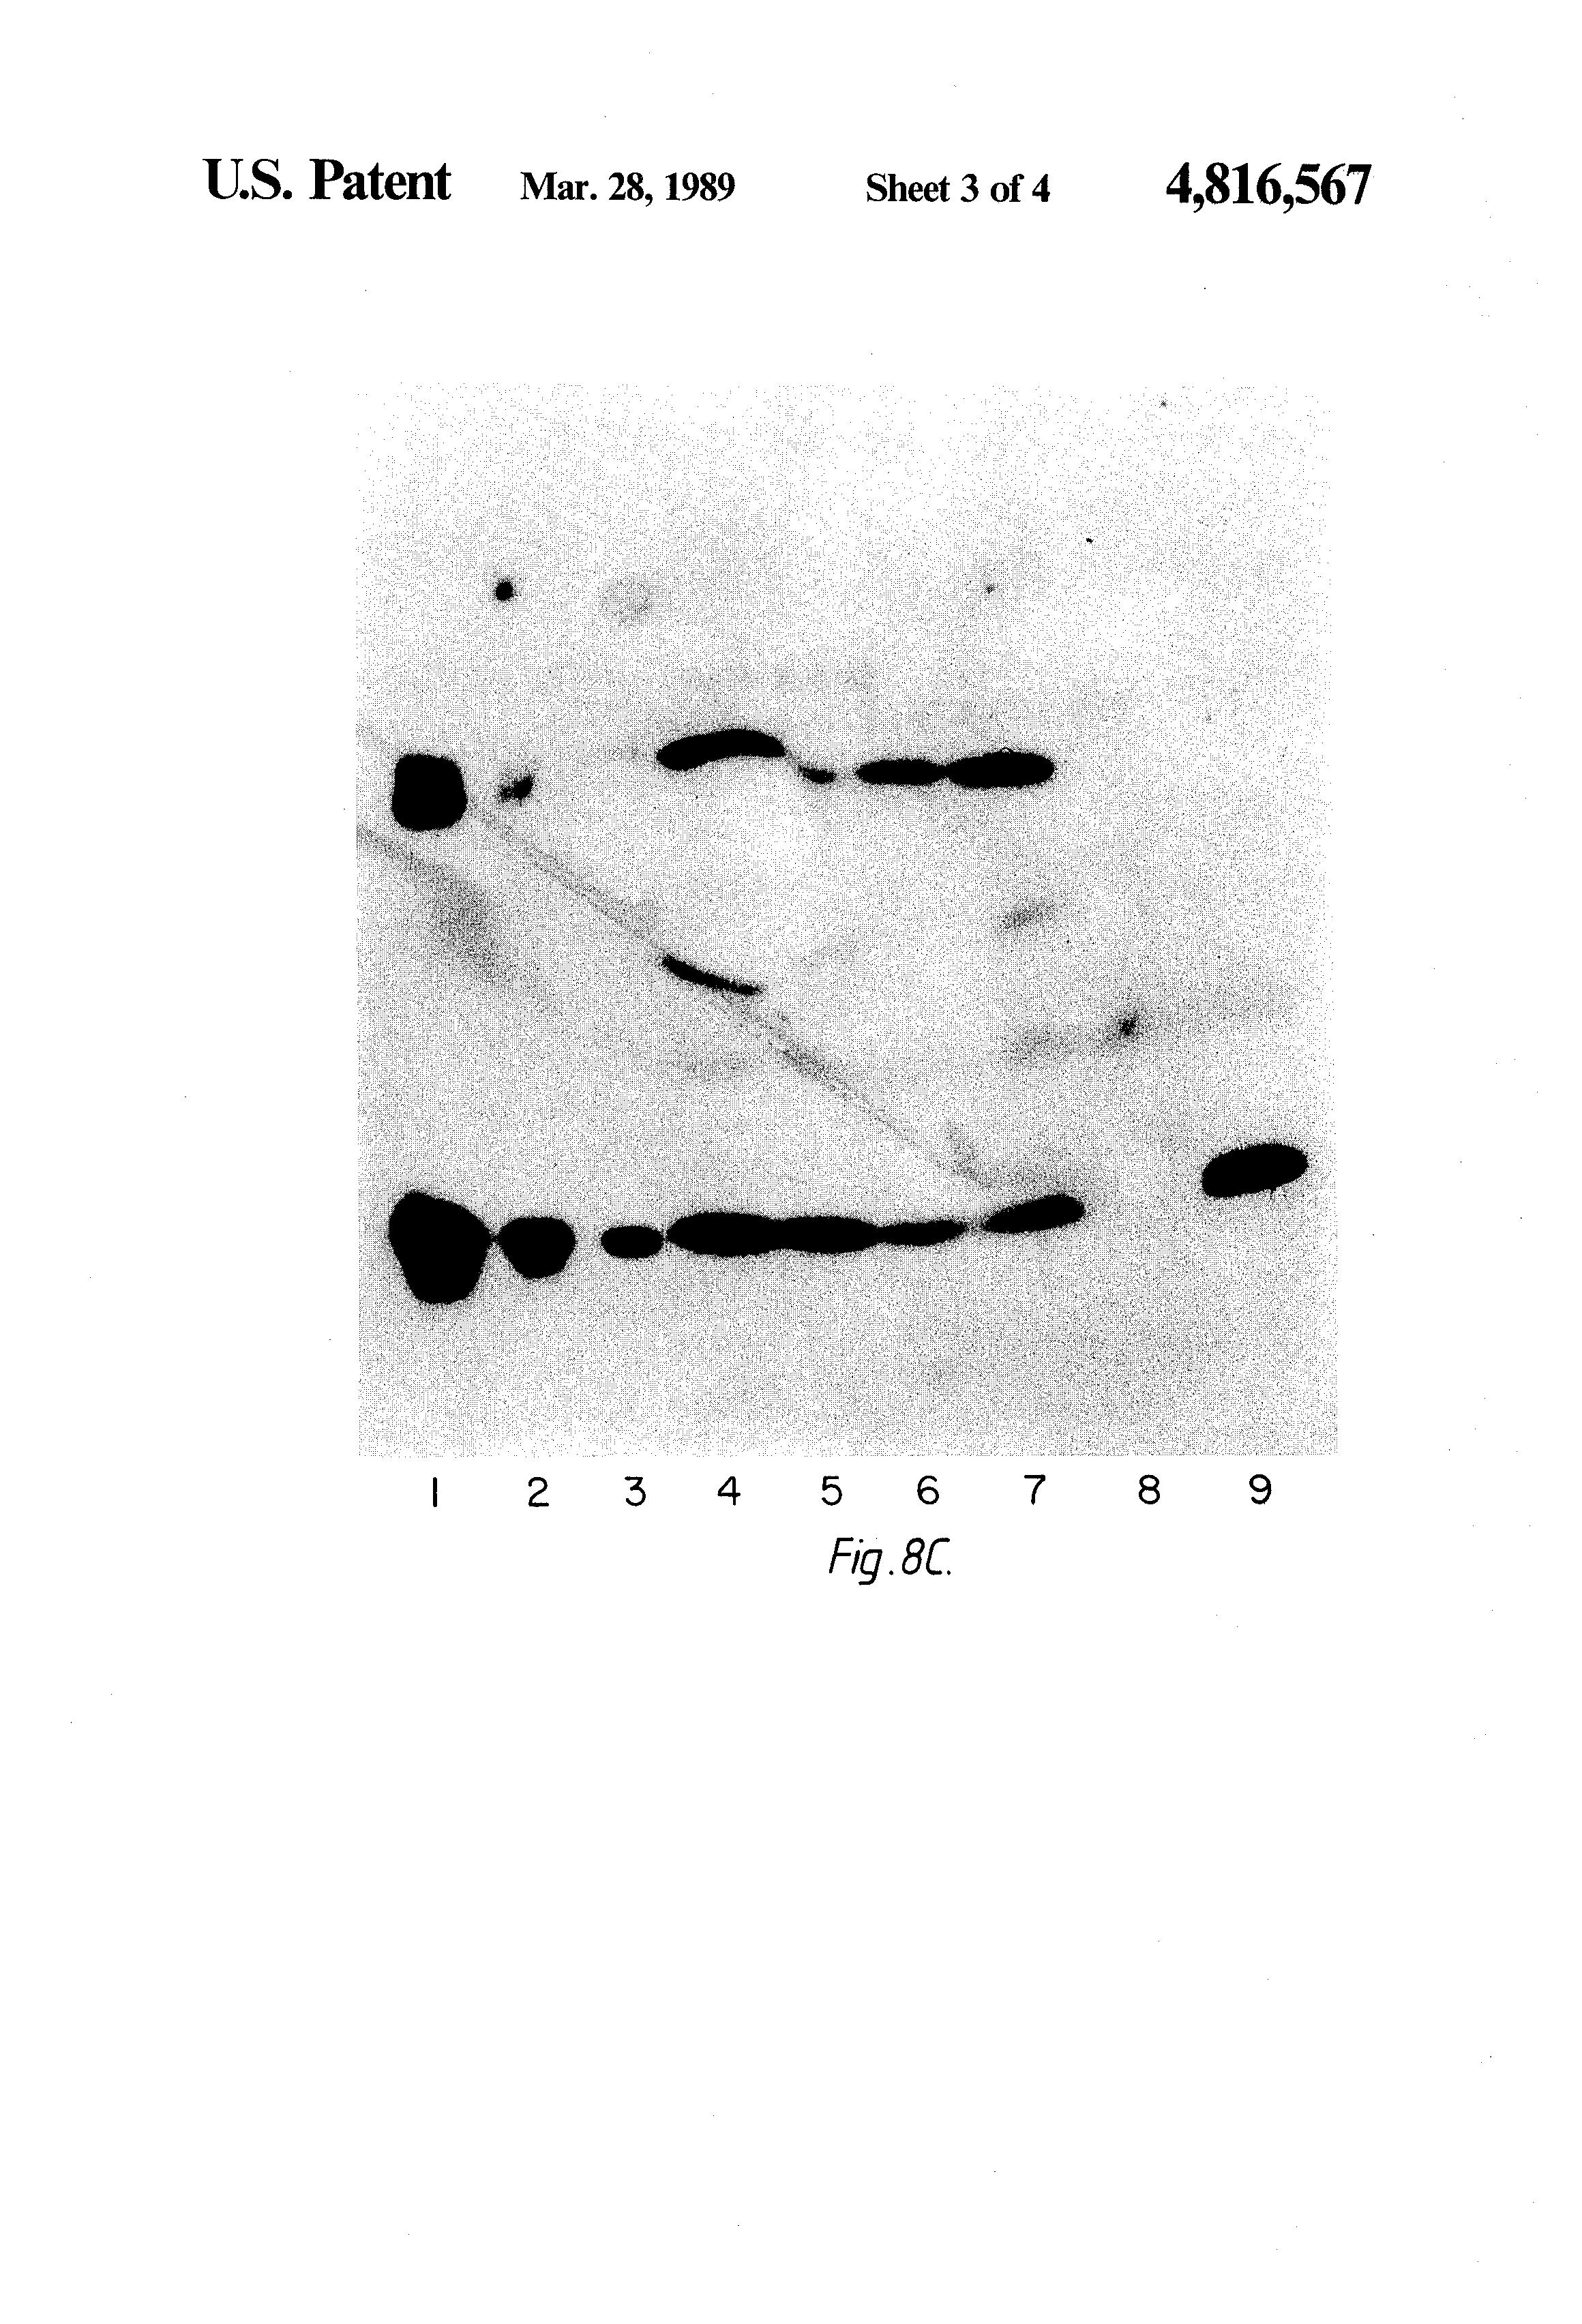 US4816567A - Recombinant immunoglobin preparations - Google Patents